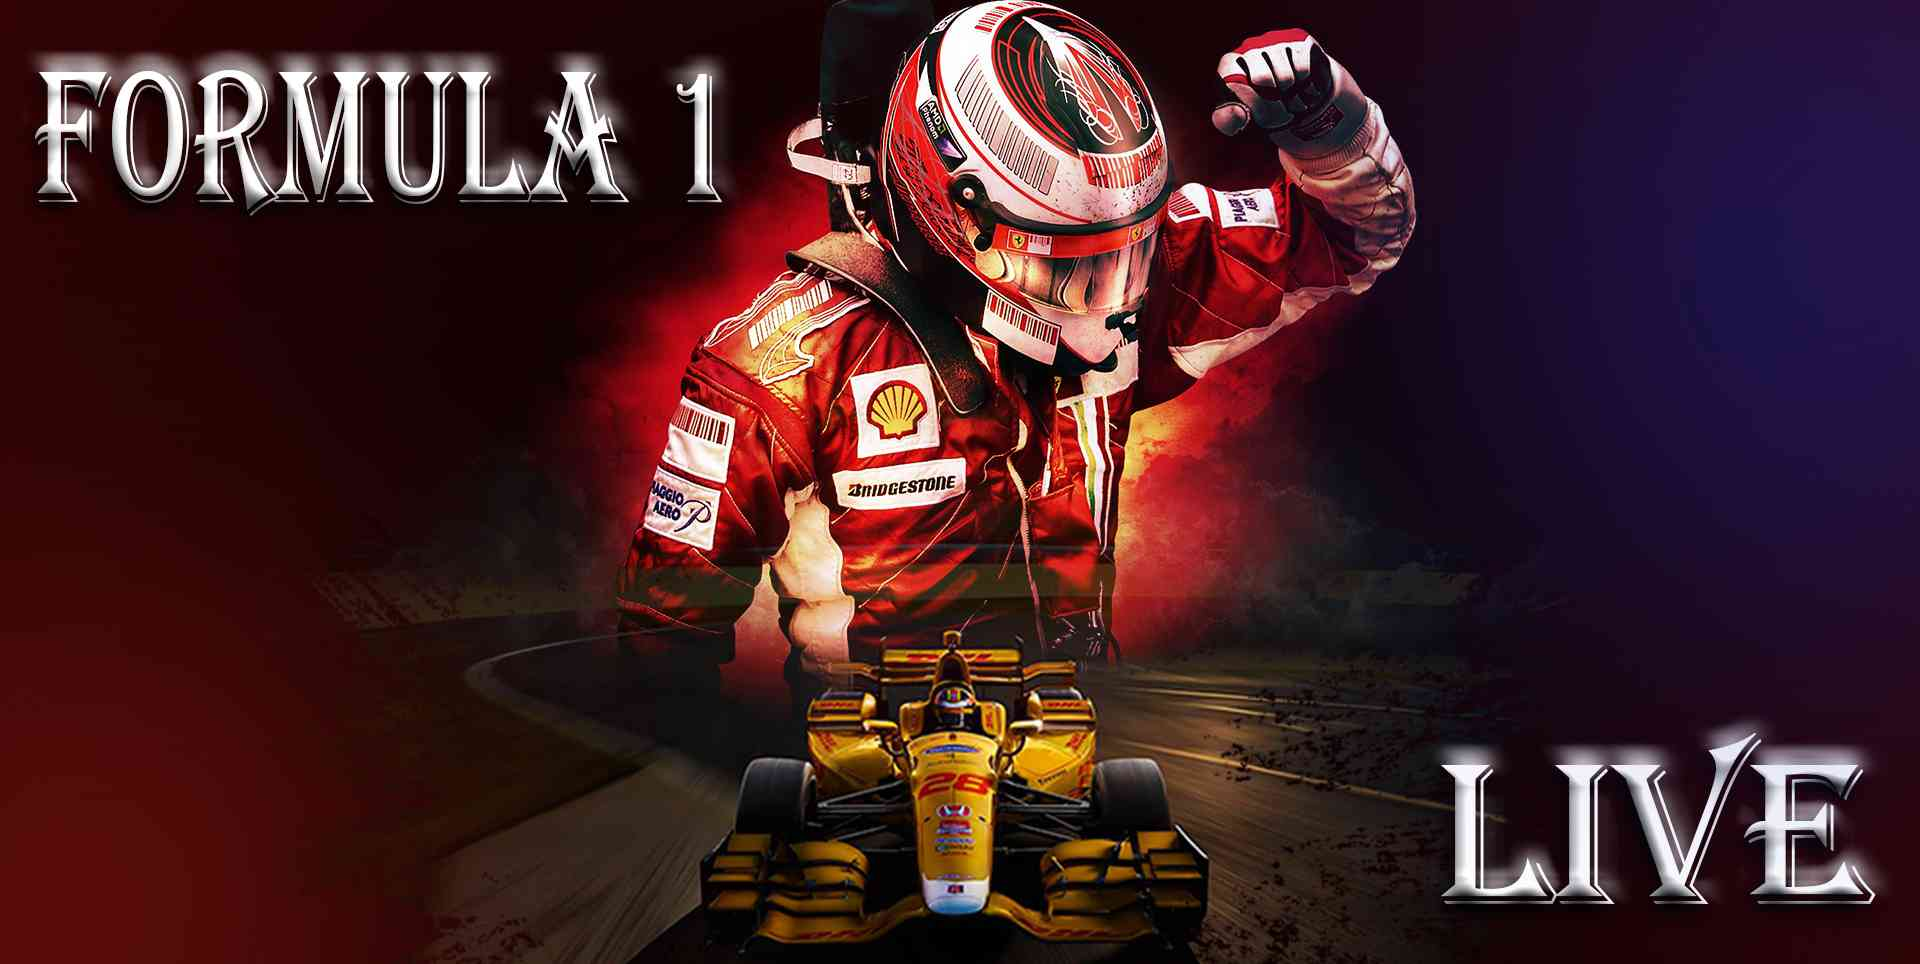 Formula 1 Hungary Grand Prix 2015 Online